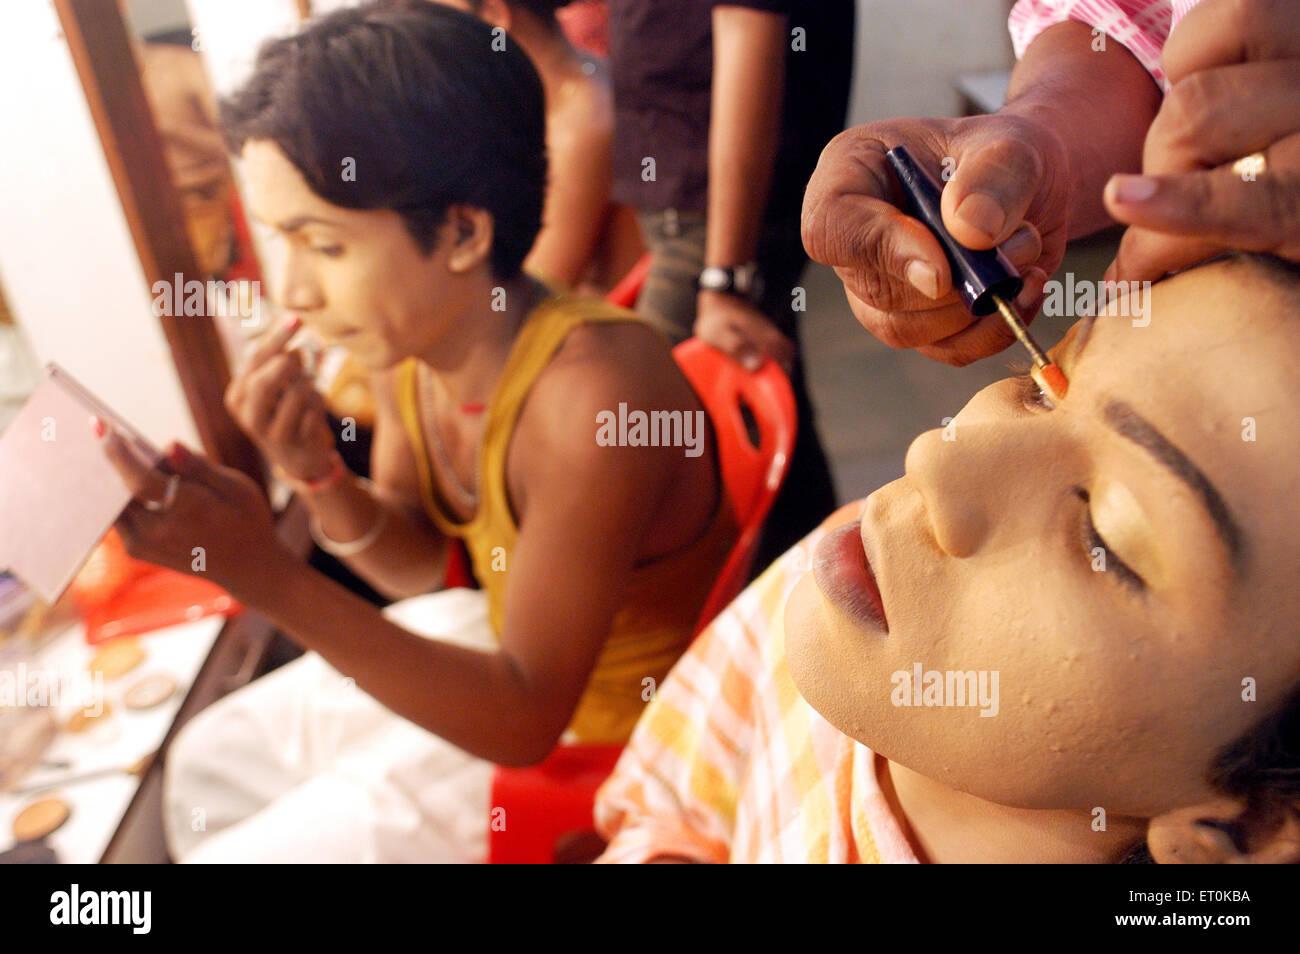 Male artist applying eye makeup and lip colors for show Bin Baicha Tamasha ; India NO MR